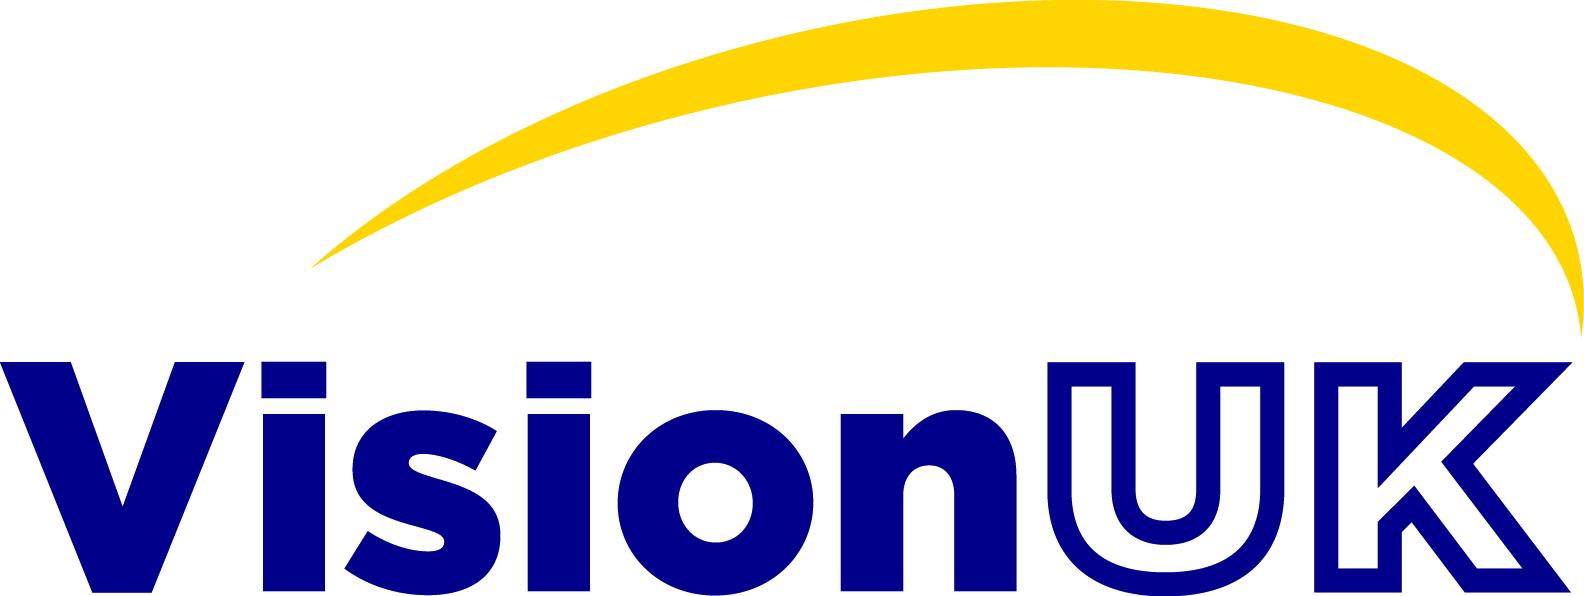 vision uk logo